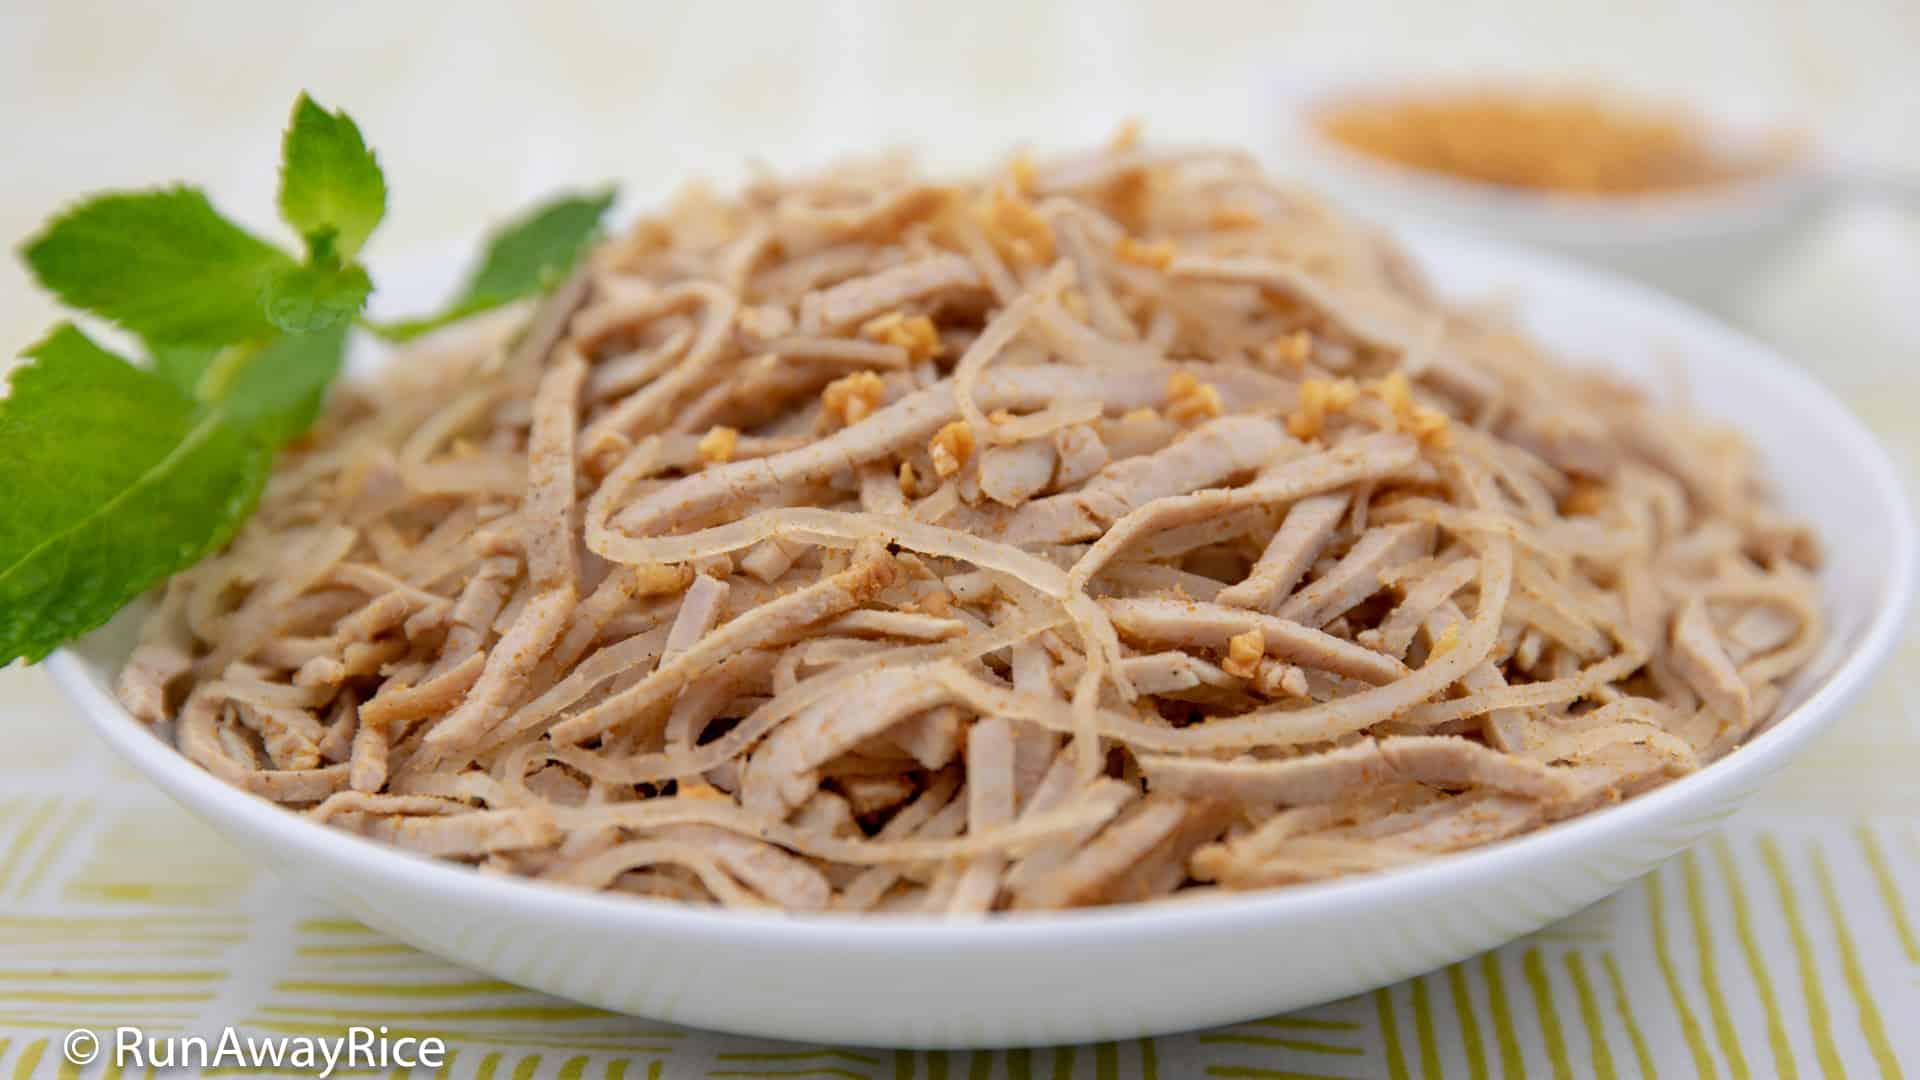 Shredded Pork Skin (Bi Heo) - One of the BEST Vietnamese Dishes!   recipe from runawayrice.com